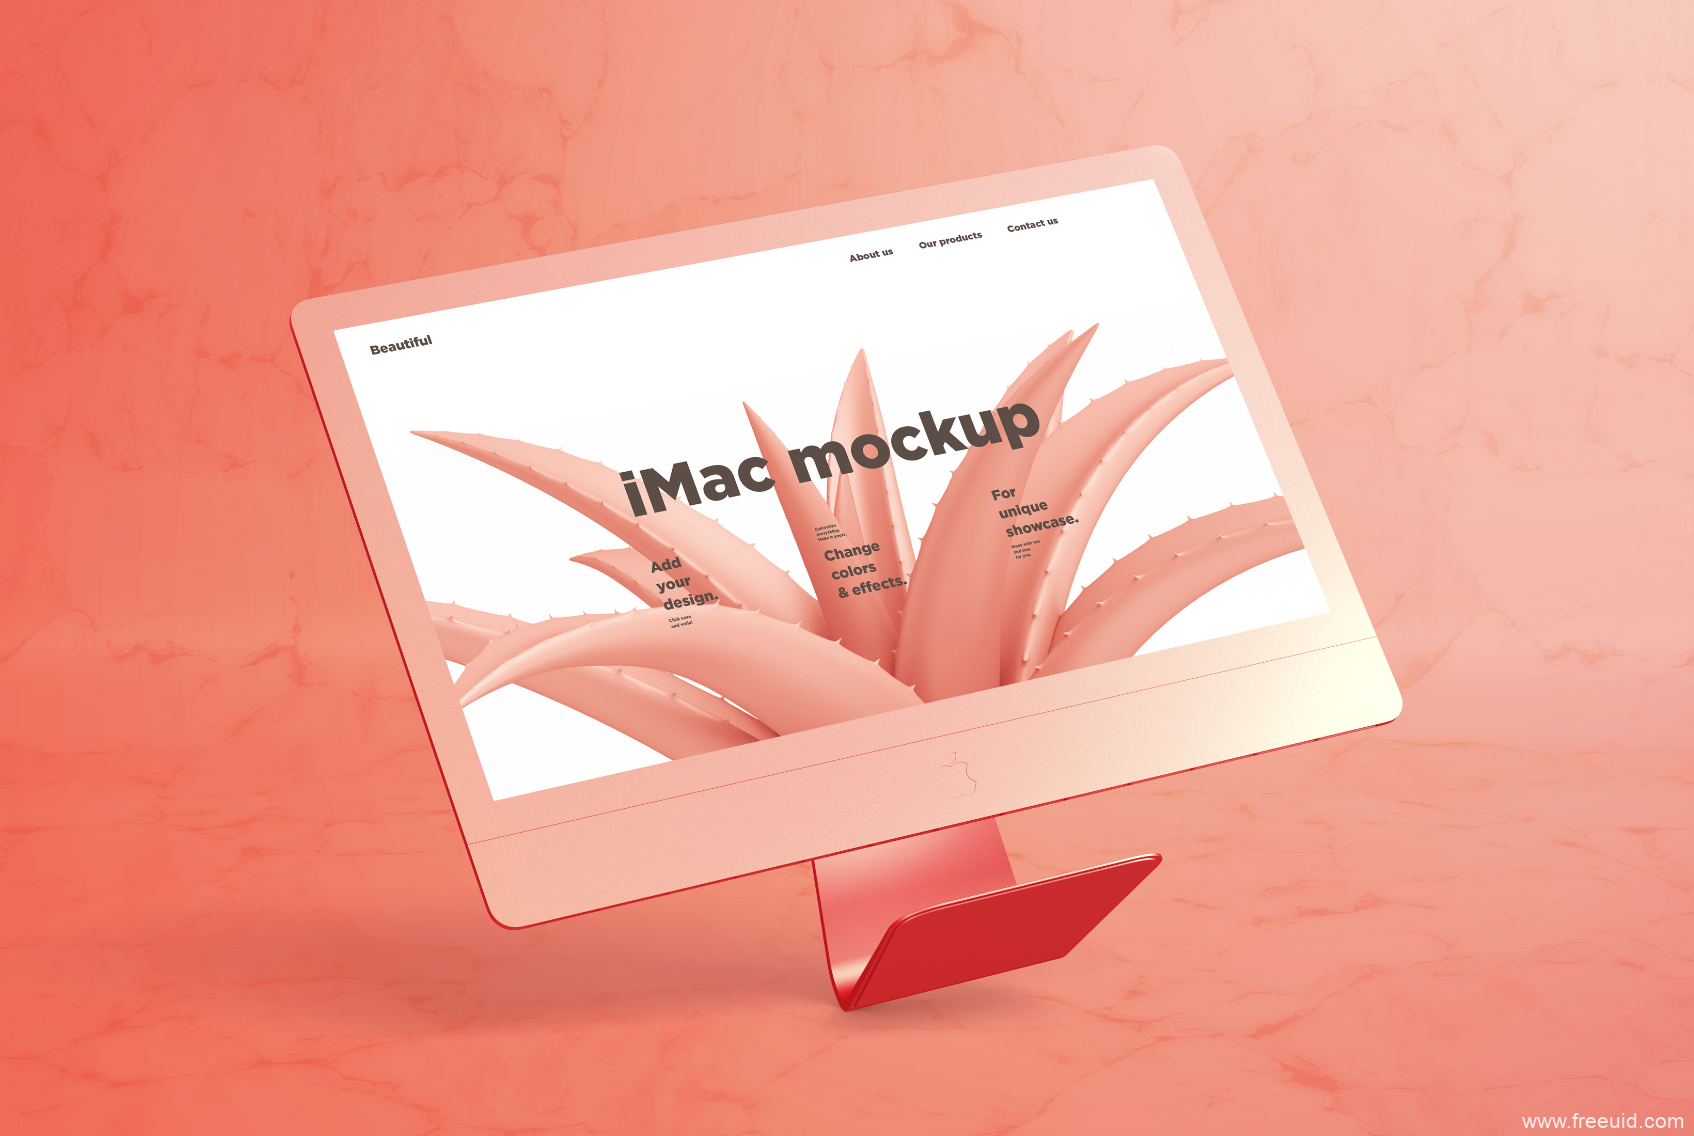 i Mac mockup样机展示模板psd源文件下载